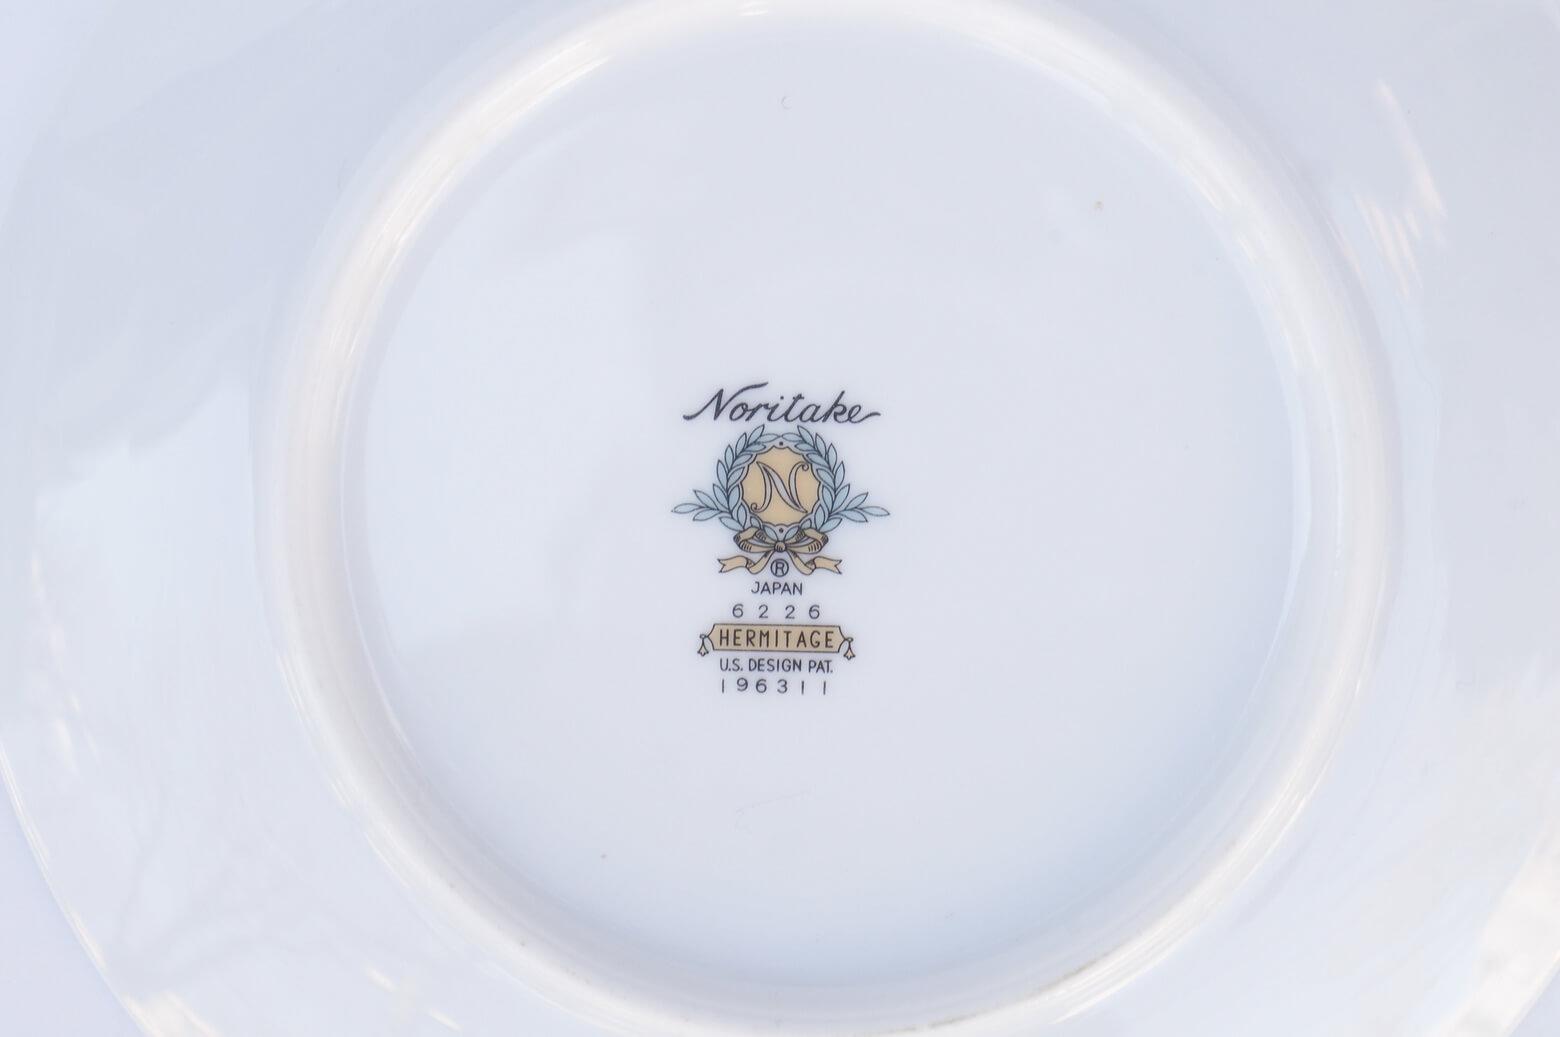 Vintage Noritake Cake Plate Hermitage U.S. Pattern Tableware/ノリタケ ケーキ プレート エルミタージュ テーブルウェア レトロ ヴィンテージ食器 5